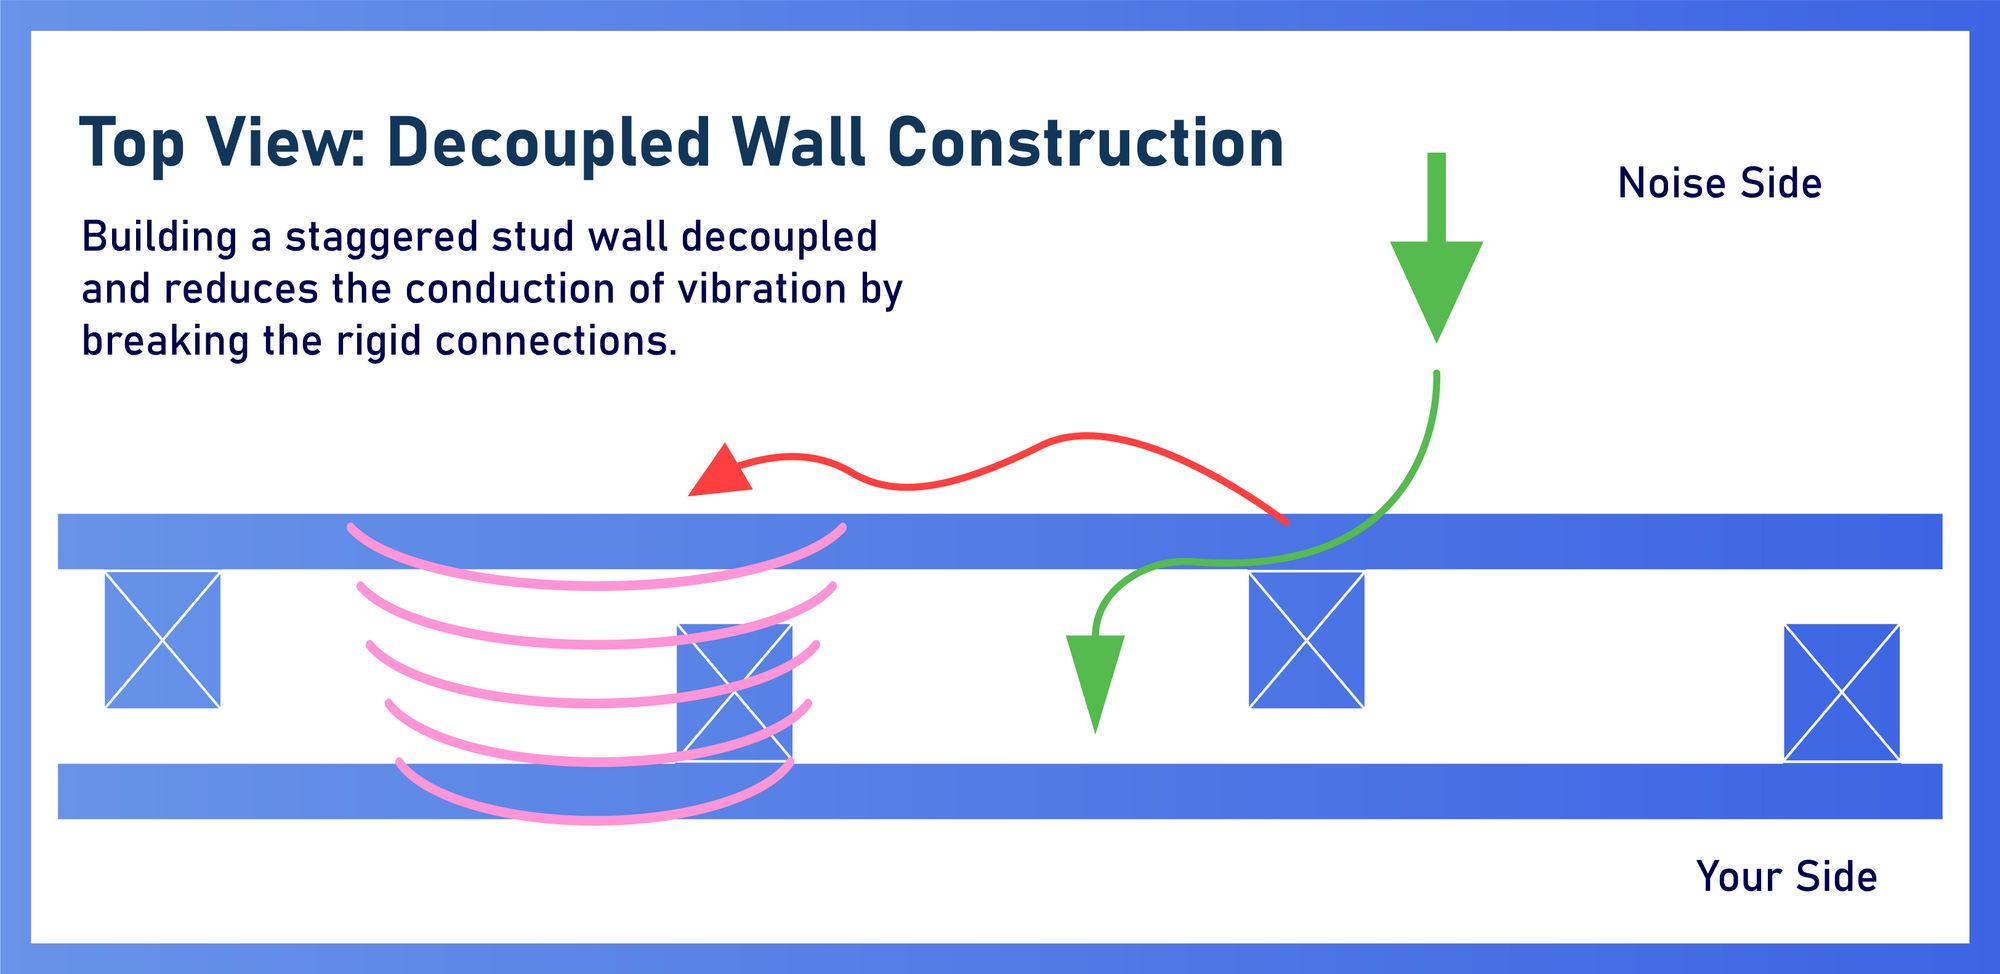 Ultrasonic Sound Detect